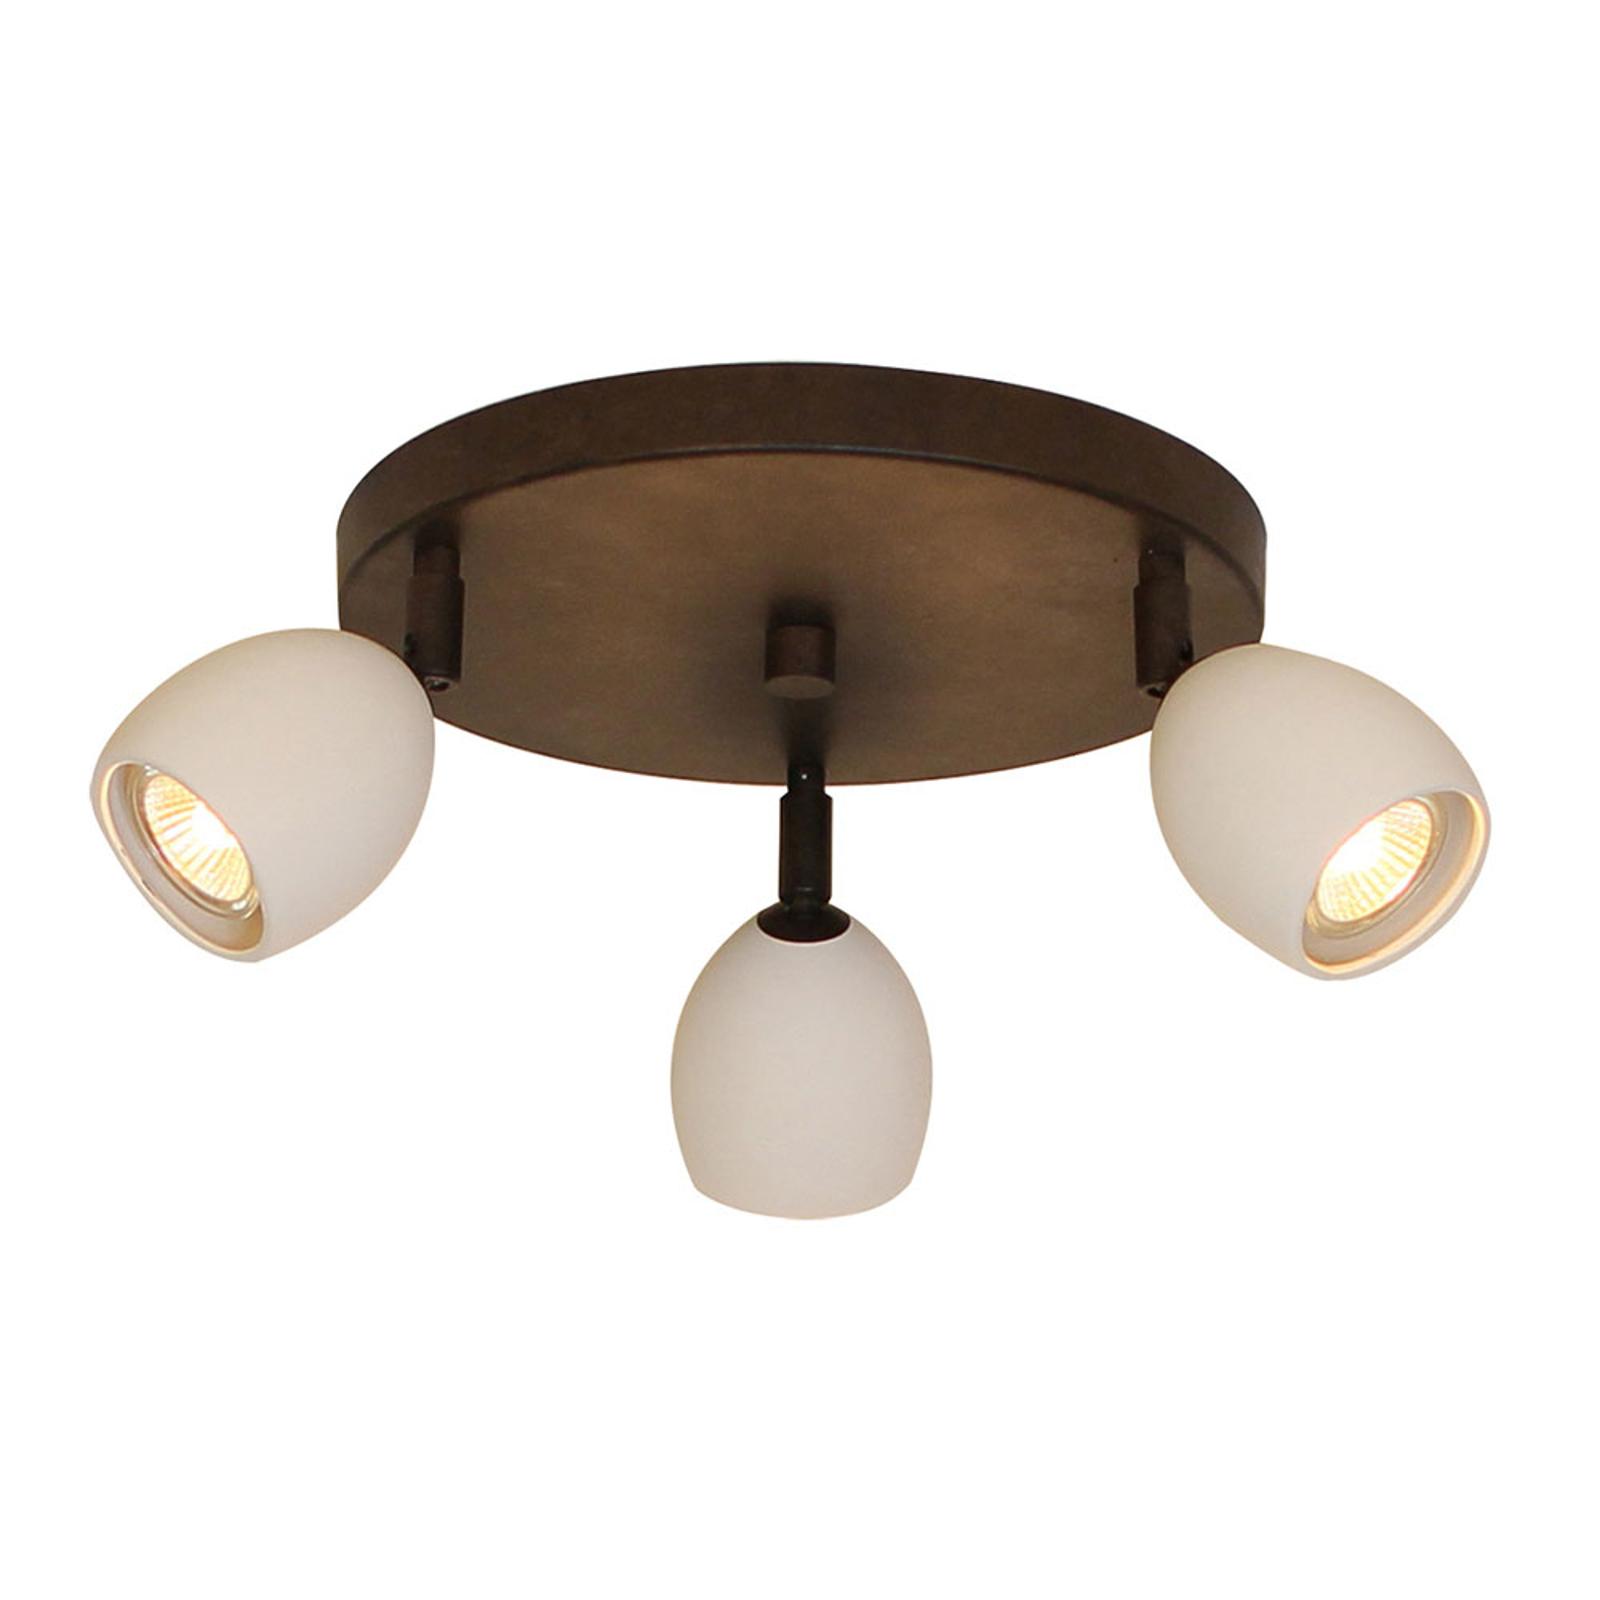 Menzel Provence loftlampe, mat, 3 lyskilder, rund